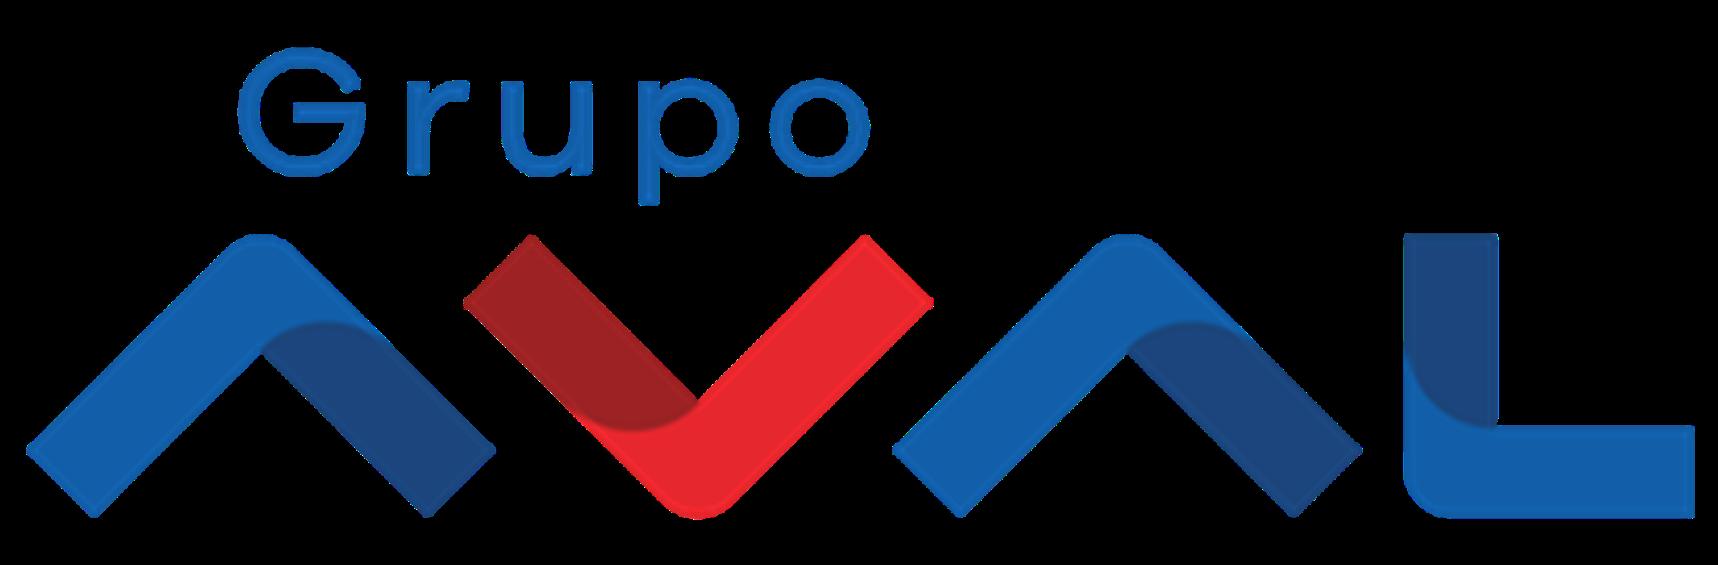 Banco Popular Colombia Logopedia Fandom Powered By Wikia